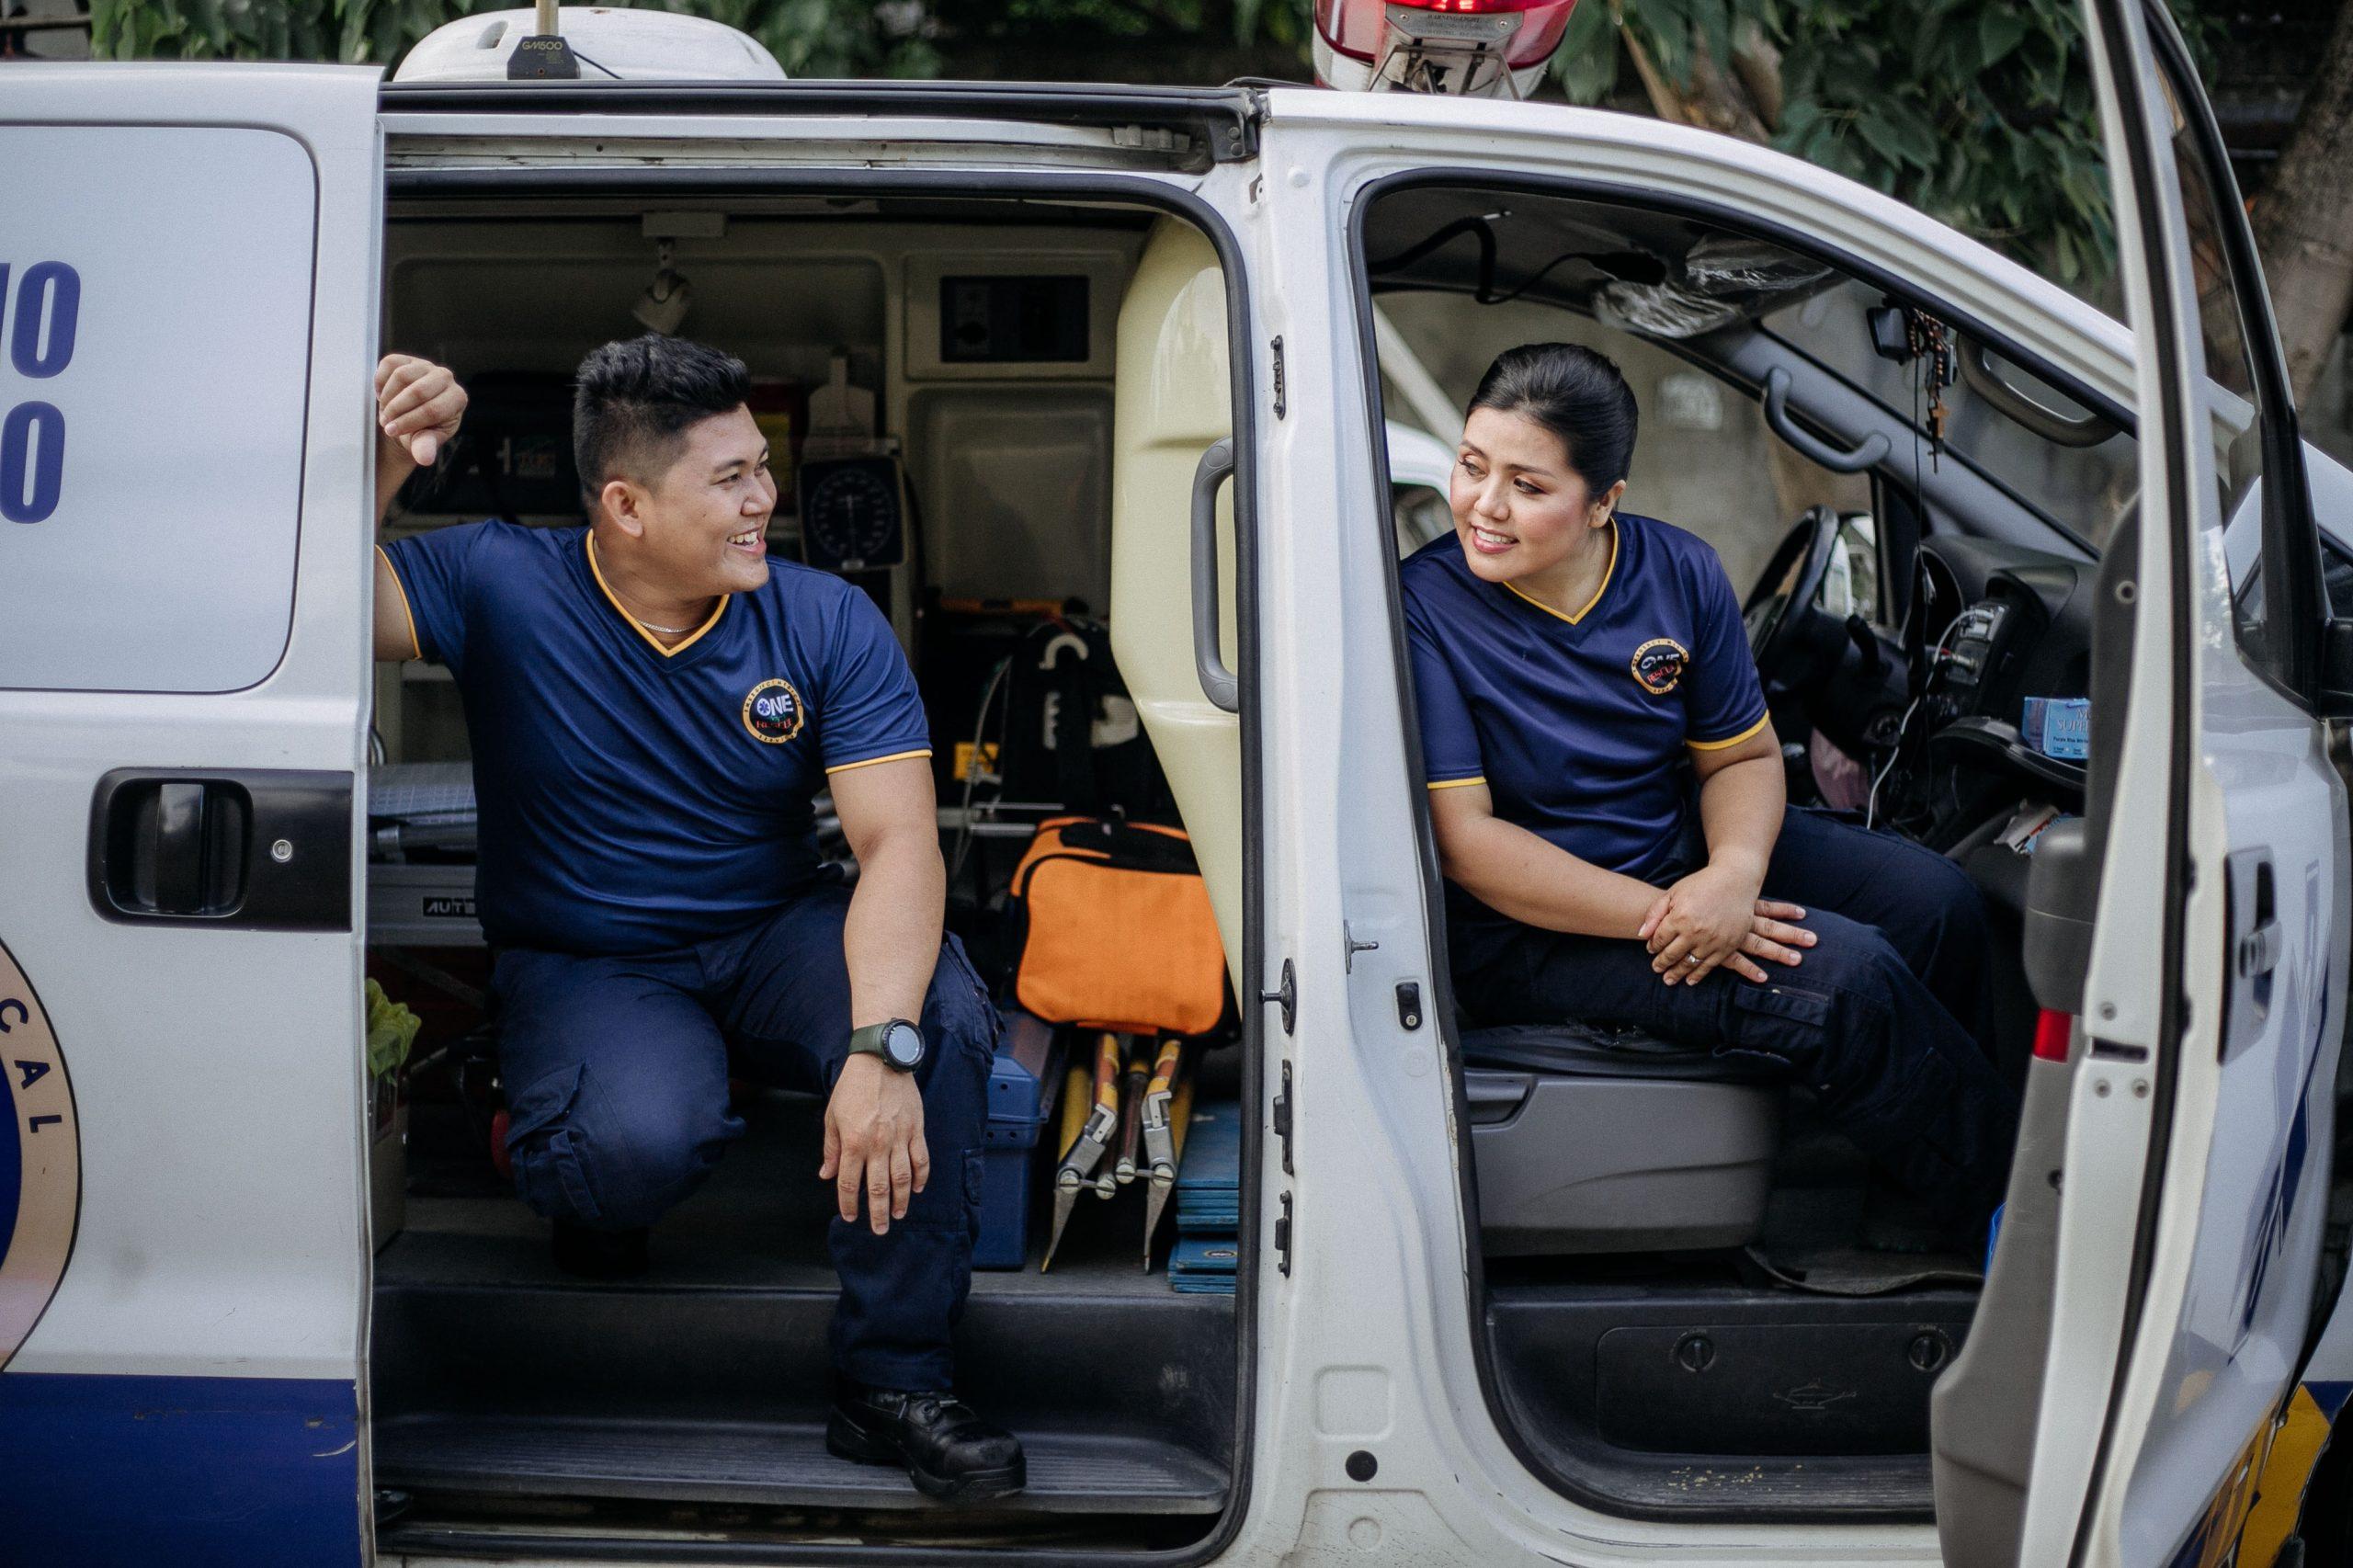 Ambulanciers val d'oise 95